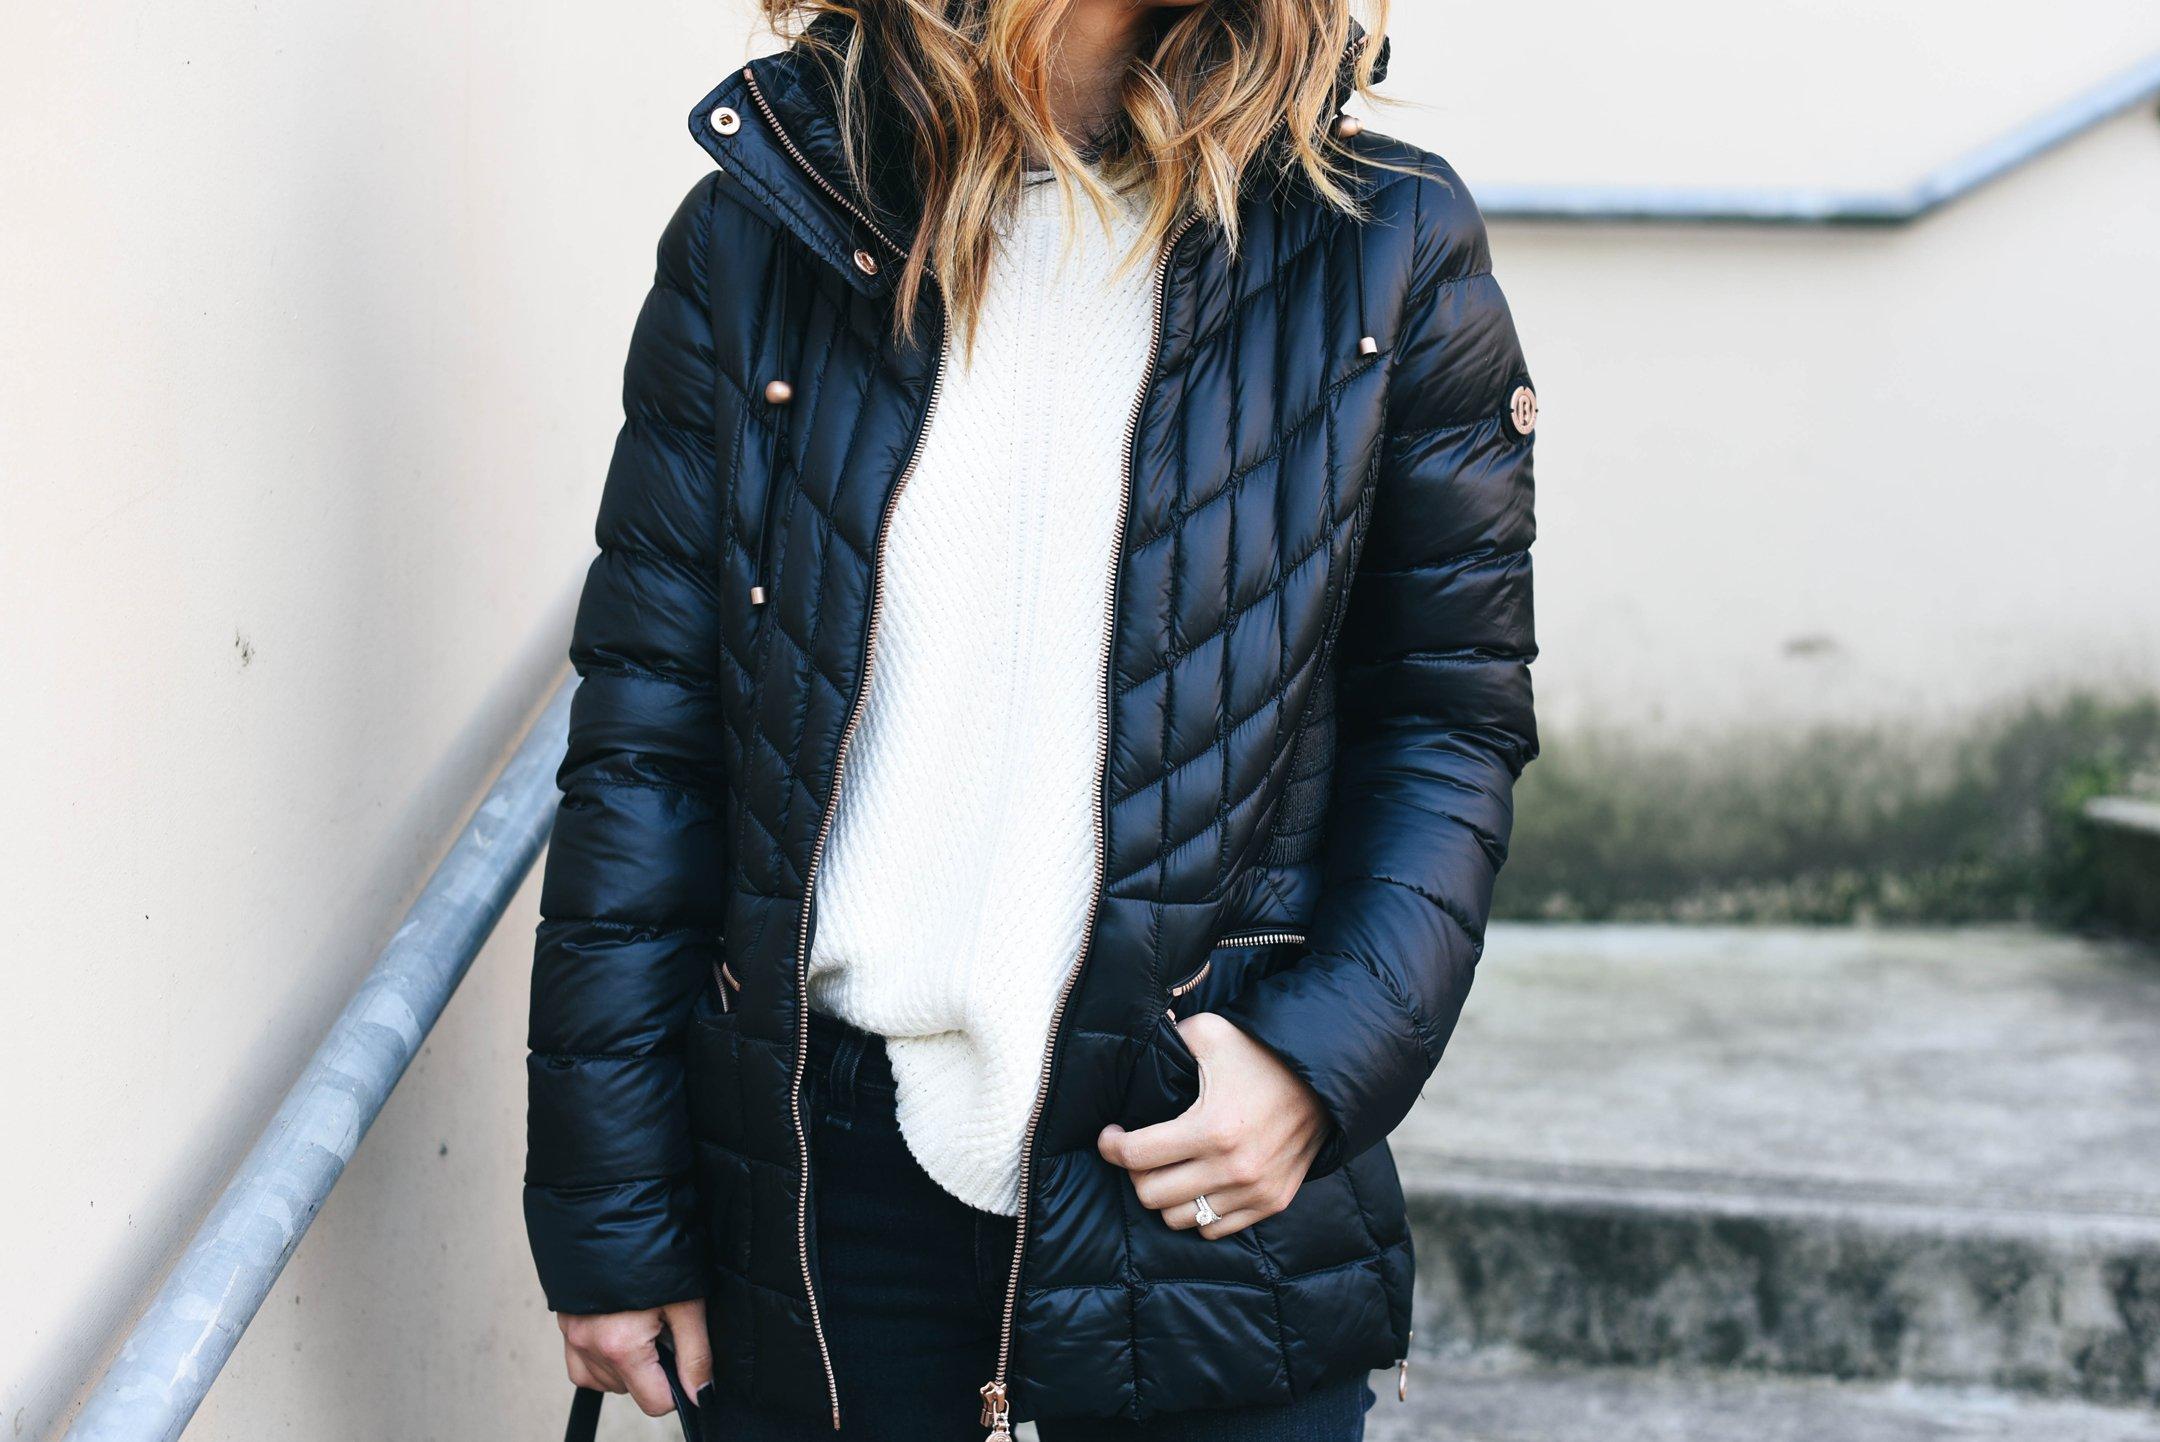 5ab3153a62b ... crystalin-marie-wearing-bernardo-black-packable-jacket-with- ...